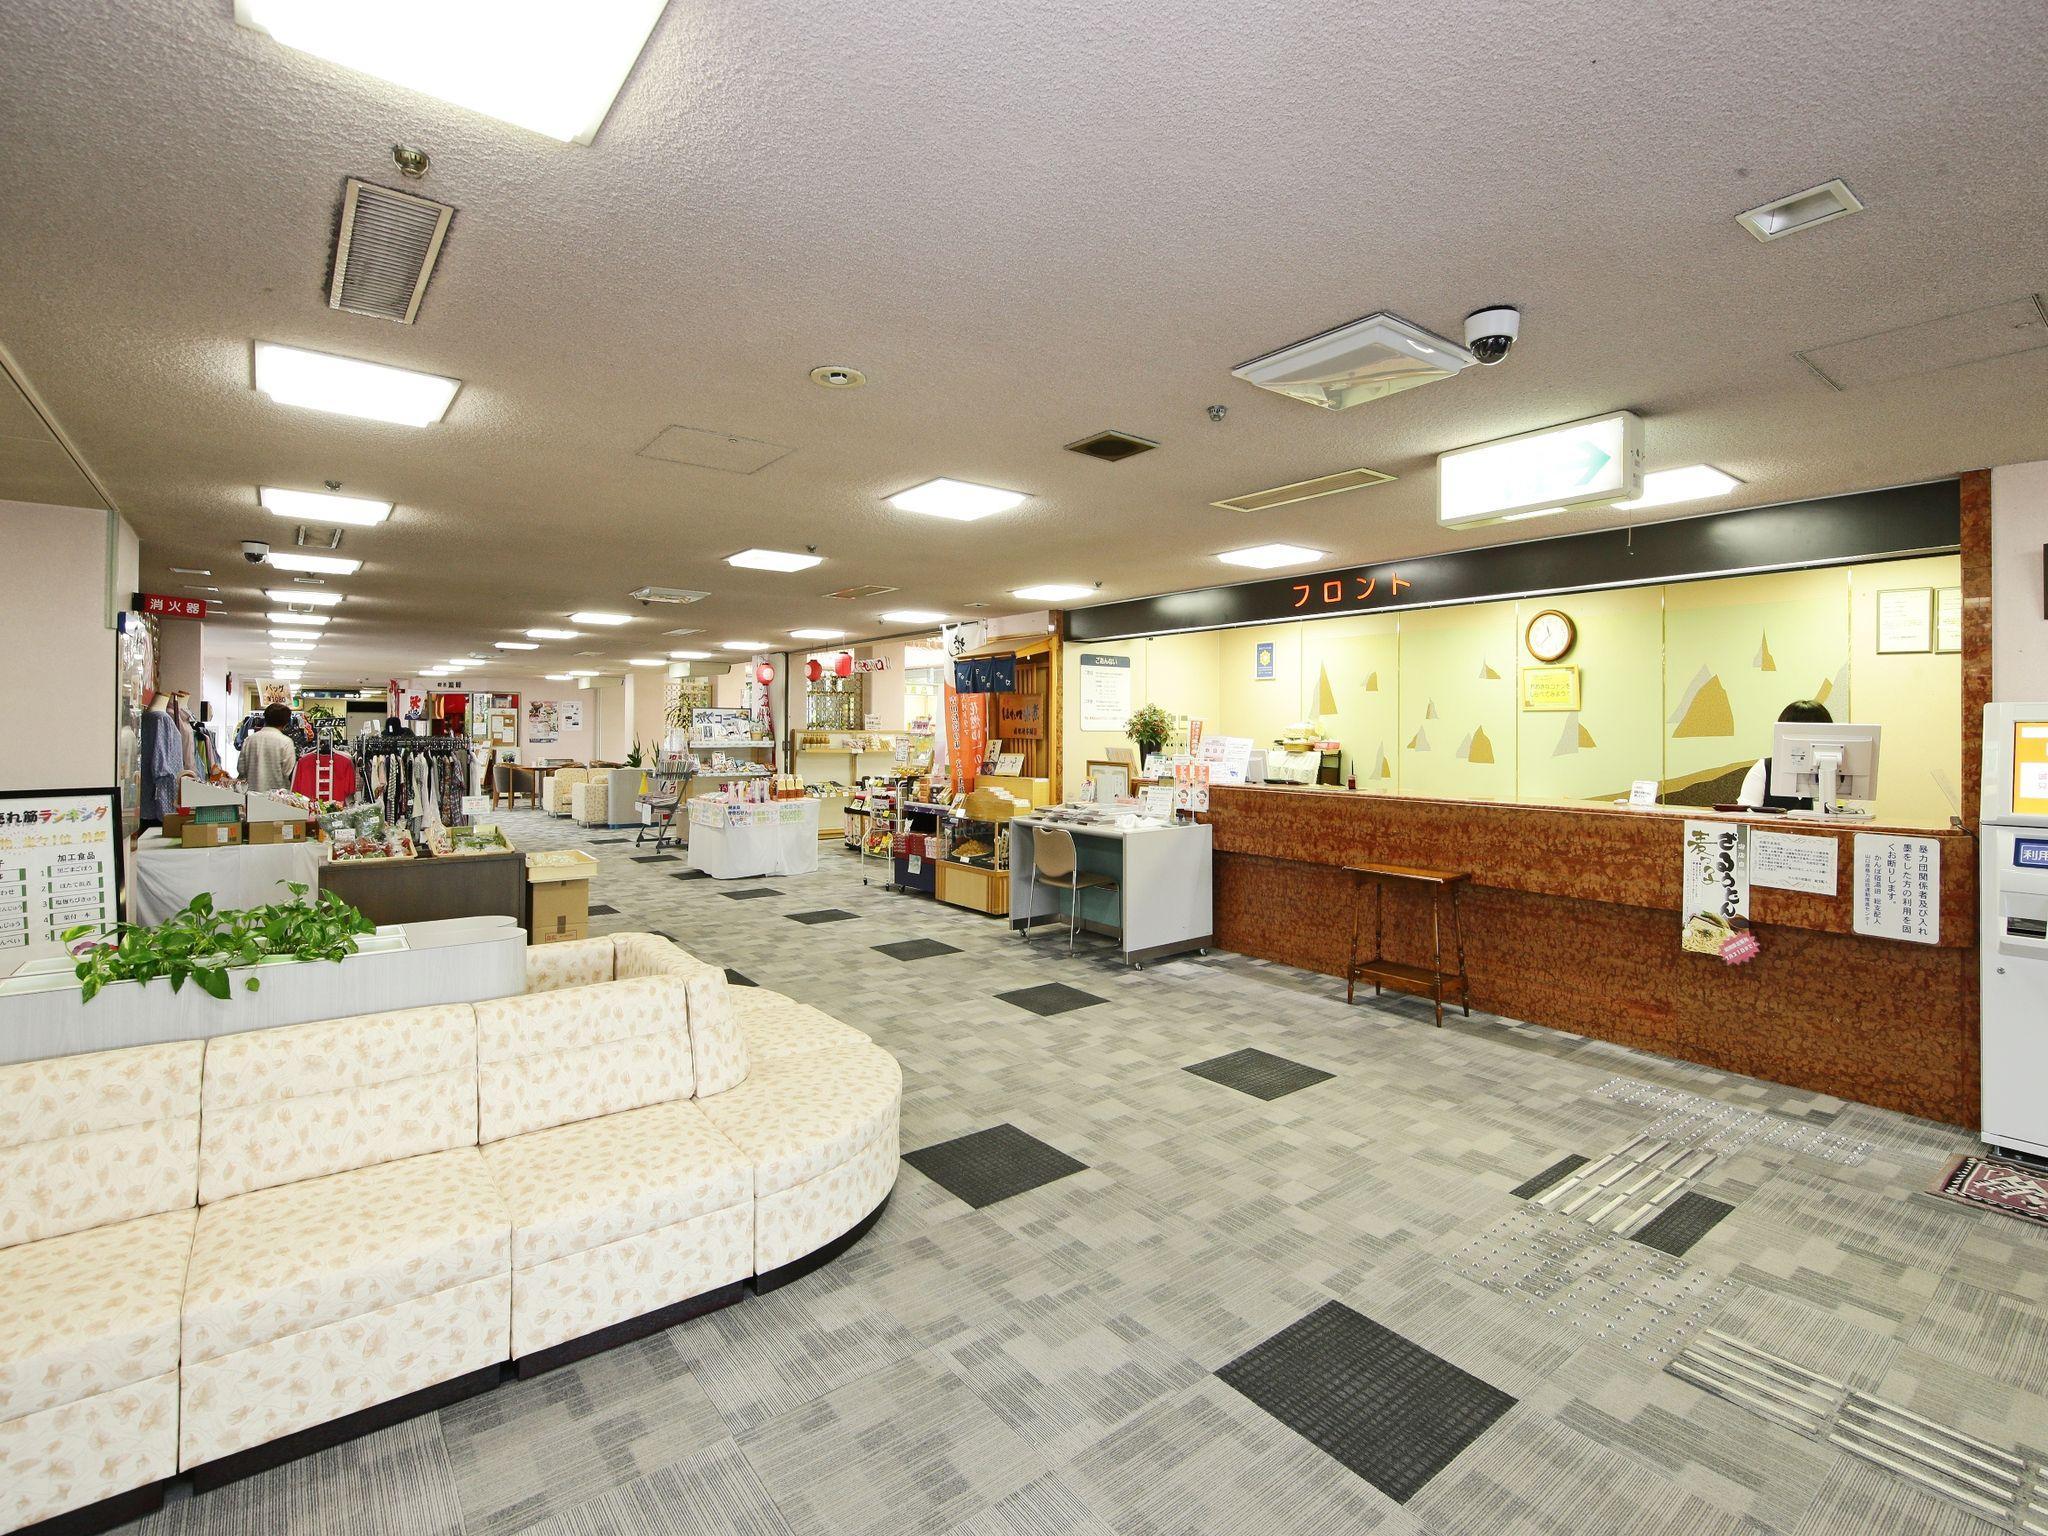 Kanponoyado Yuda, Yamaguchi